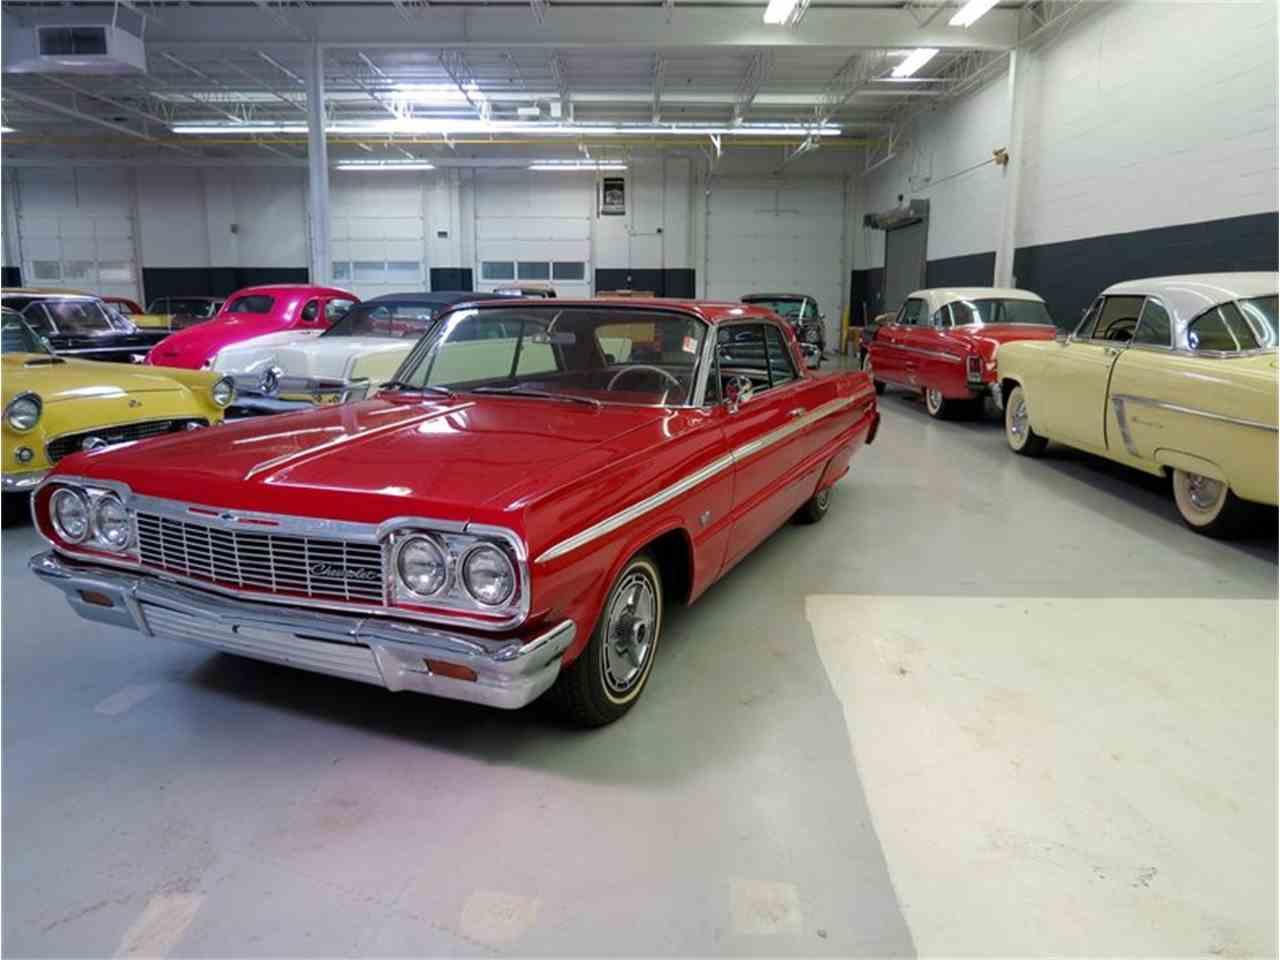 1964 chevrolet impala ss for sale cc 979545. Black Bedroom Furniture Sets. Home Design Ideas